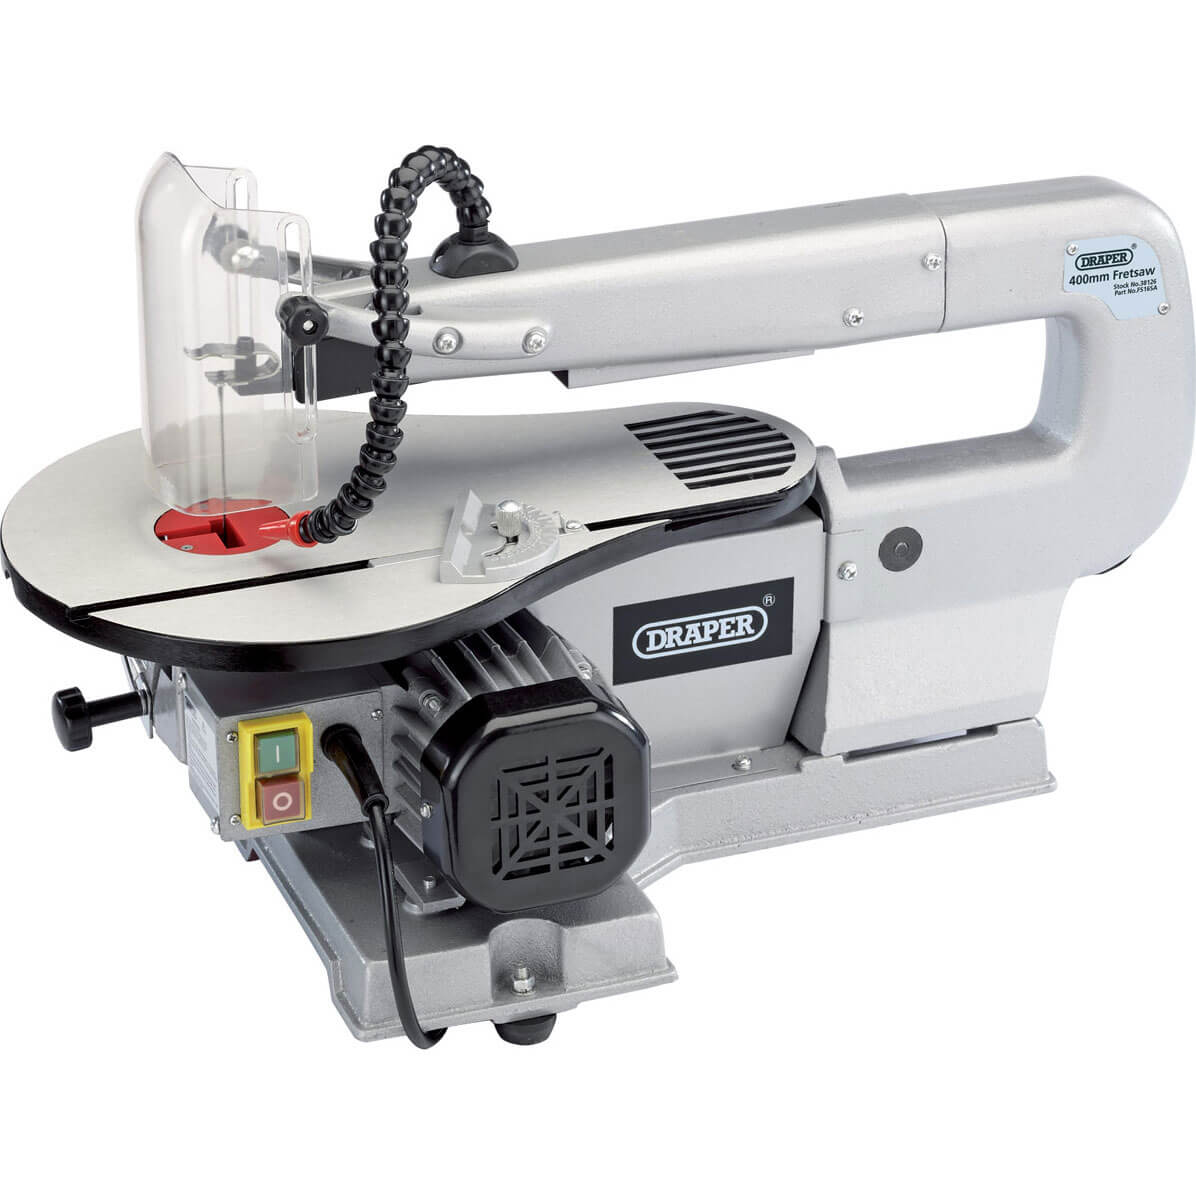 Image of Draper FS16SA Tilting Fretsaw 240v